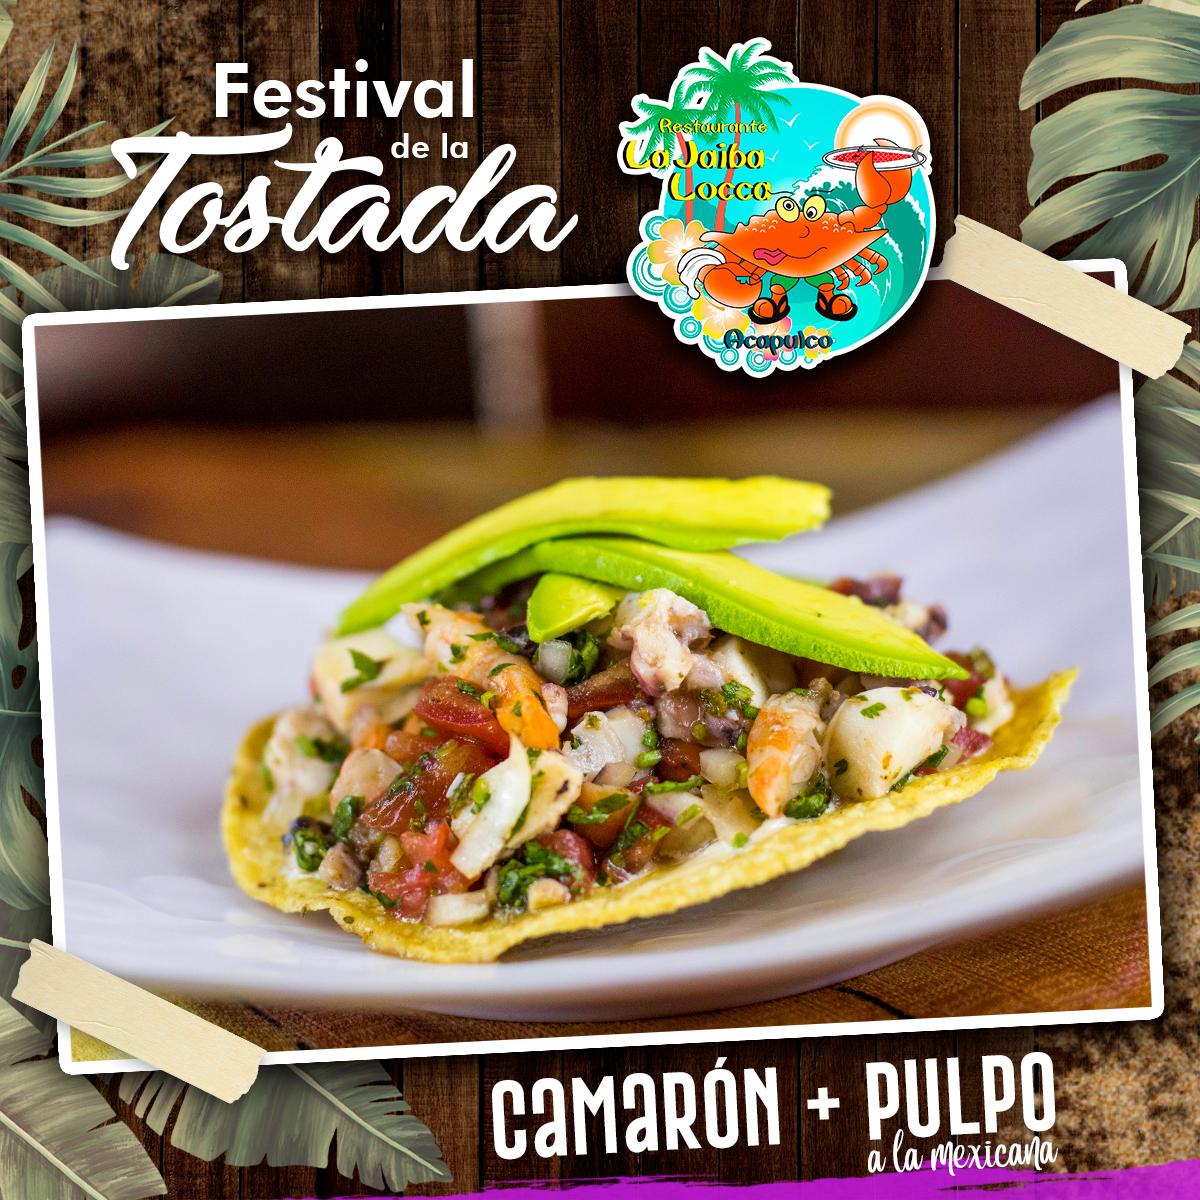 https://0201.nccdn.net/1_2/000/000/161/7e2/camar--n-con-pulpo--a-la-mexicana-.jpg